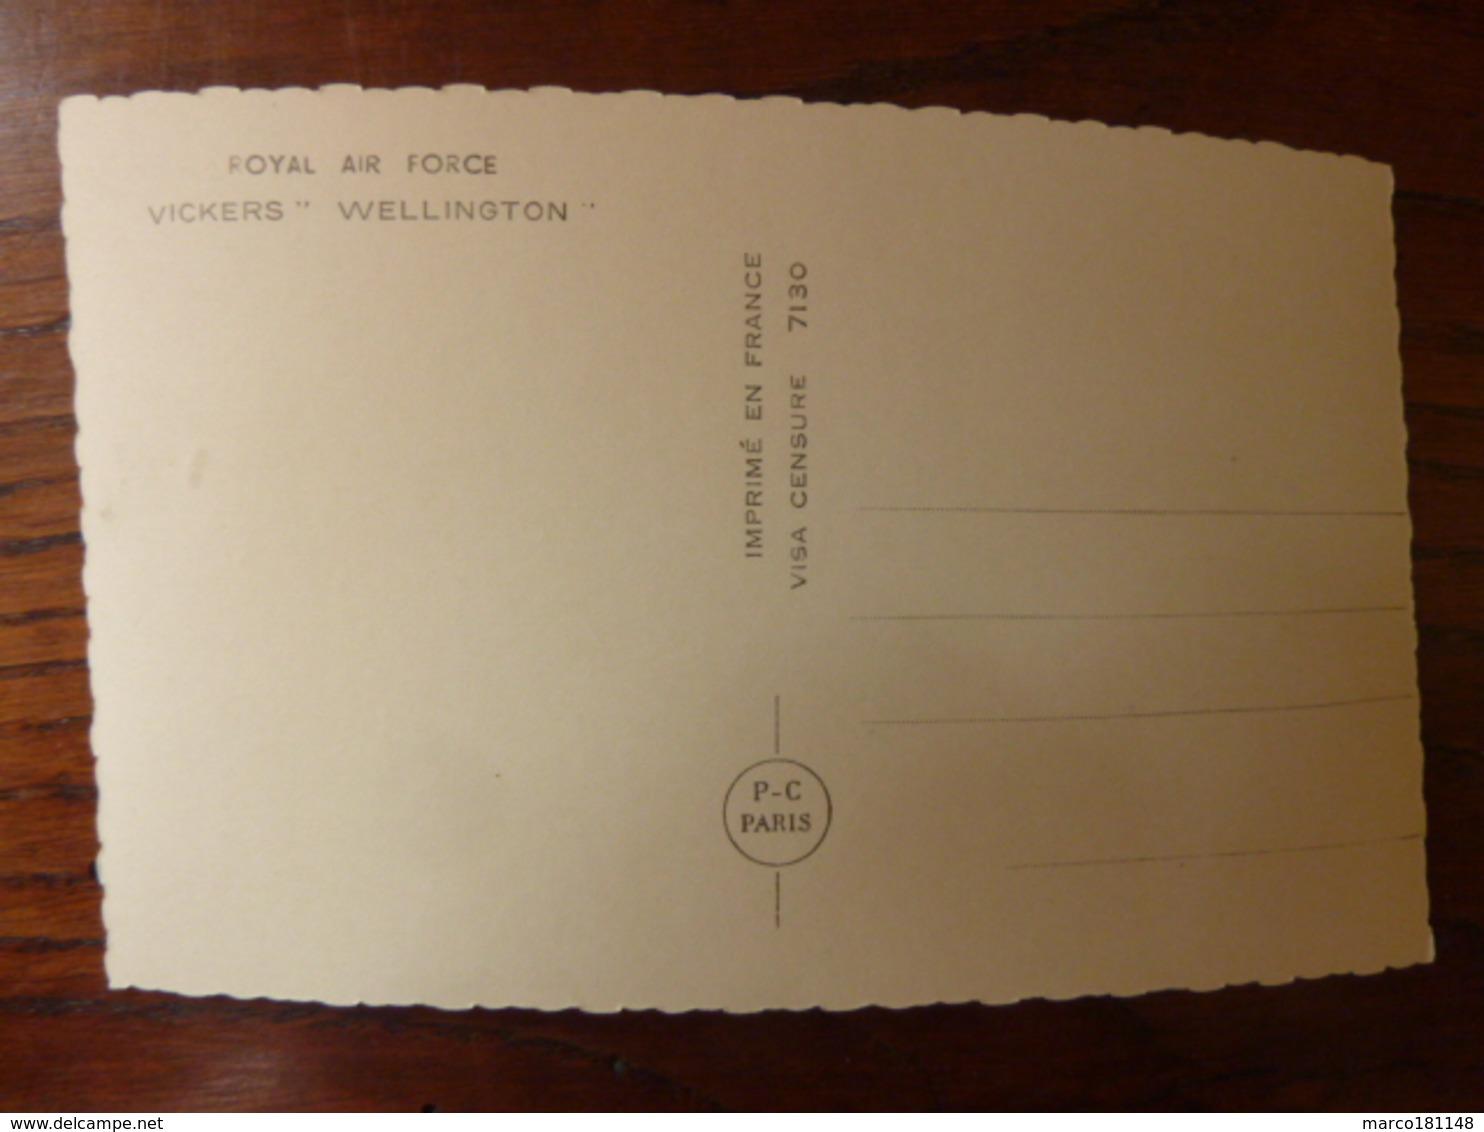 Royal Air Force - VICKERS WELLINGTON - Autres